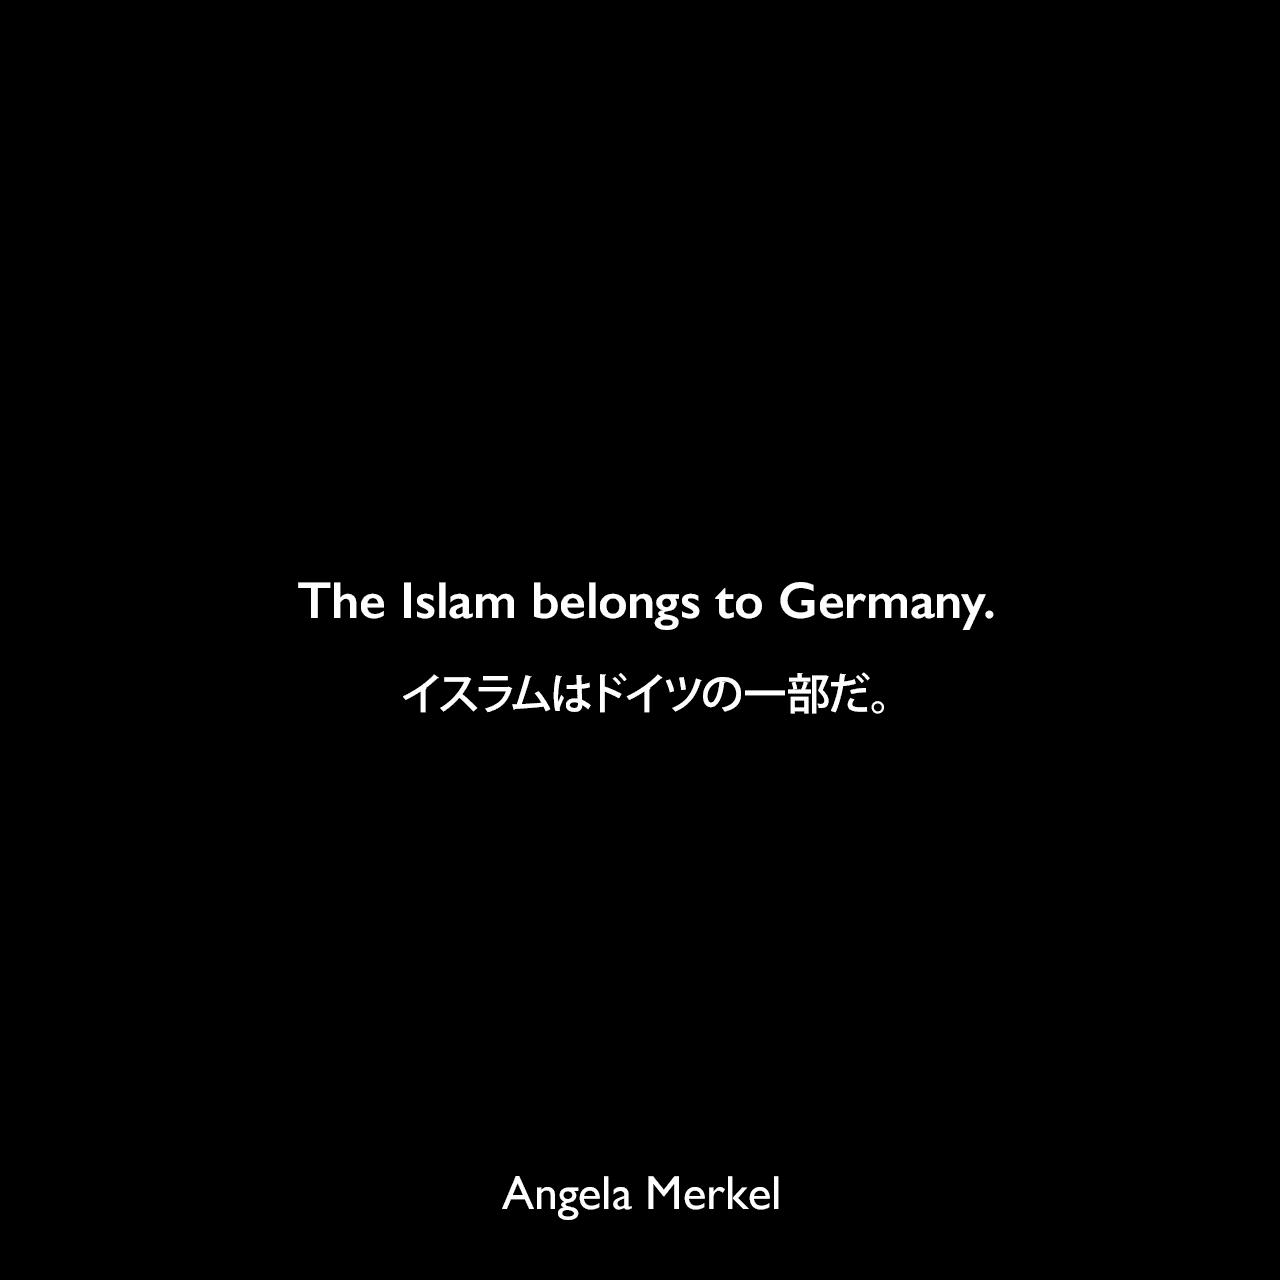 The Islam belongs to Germany.イスラムはドイツの一部だ。- 2015年1月、トルコのダヴトウル大臣との記者会見よりAngela Merkel